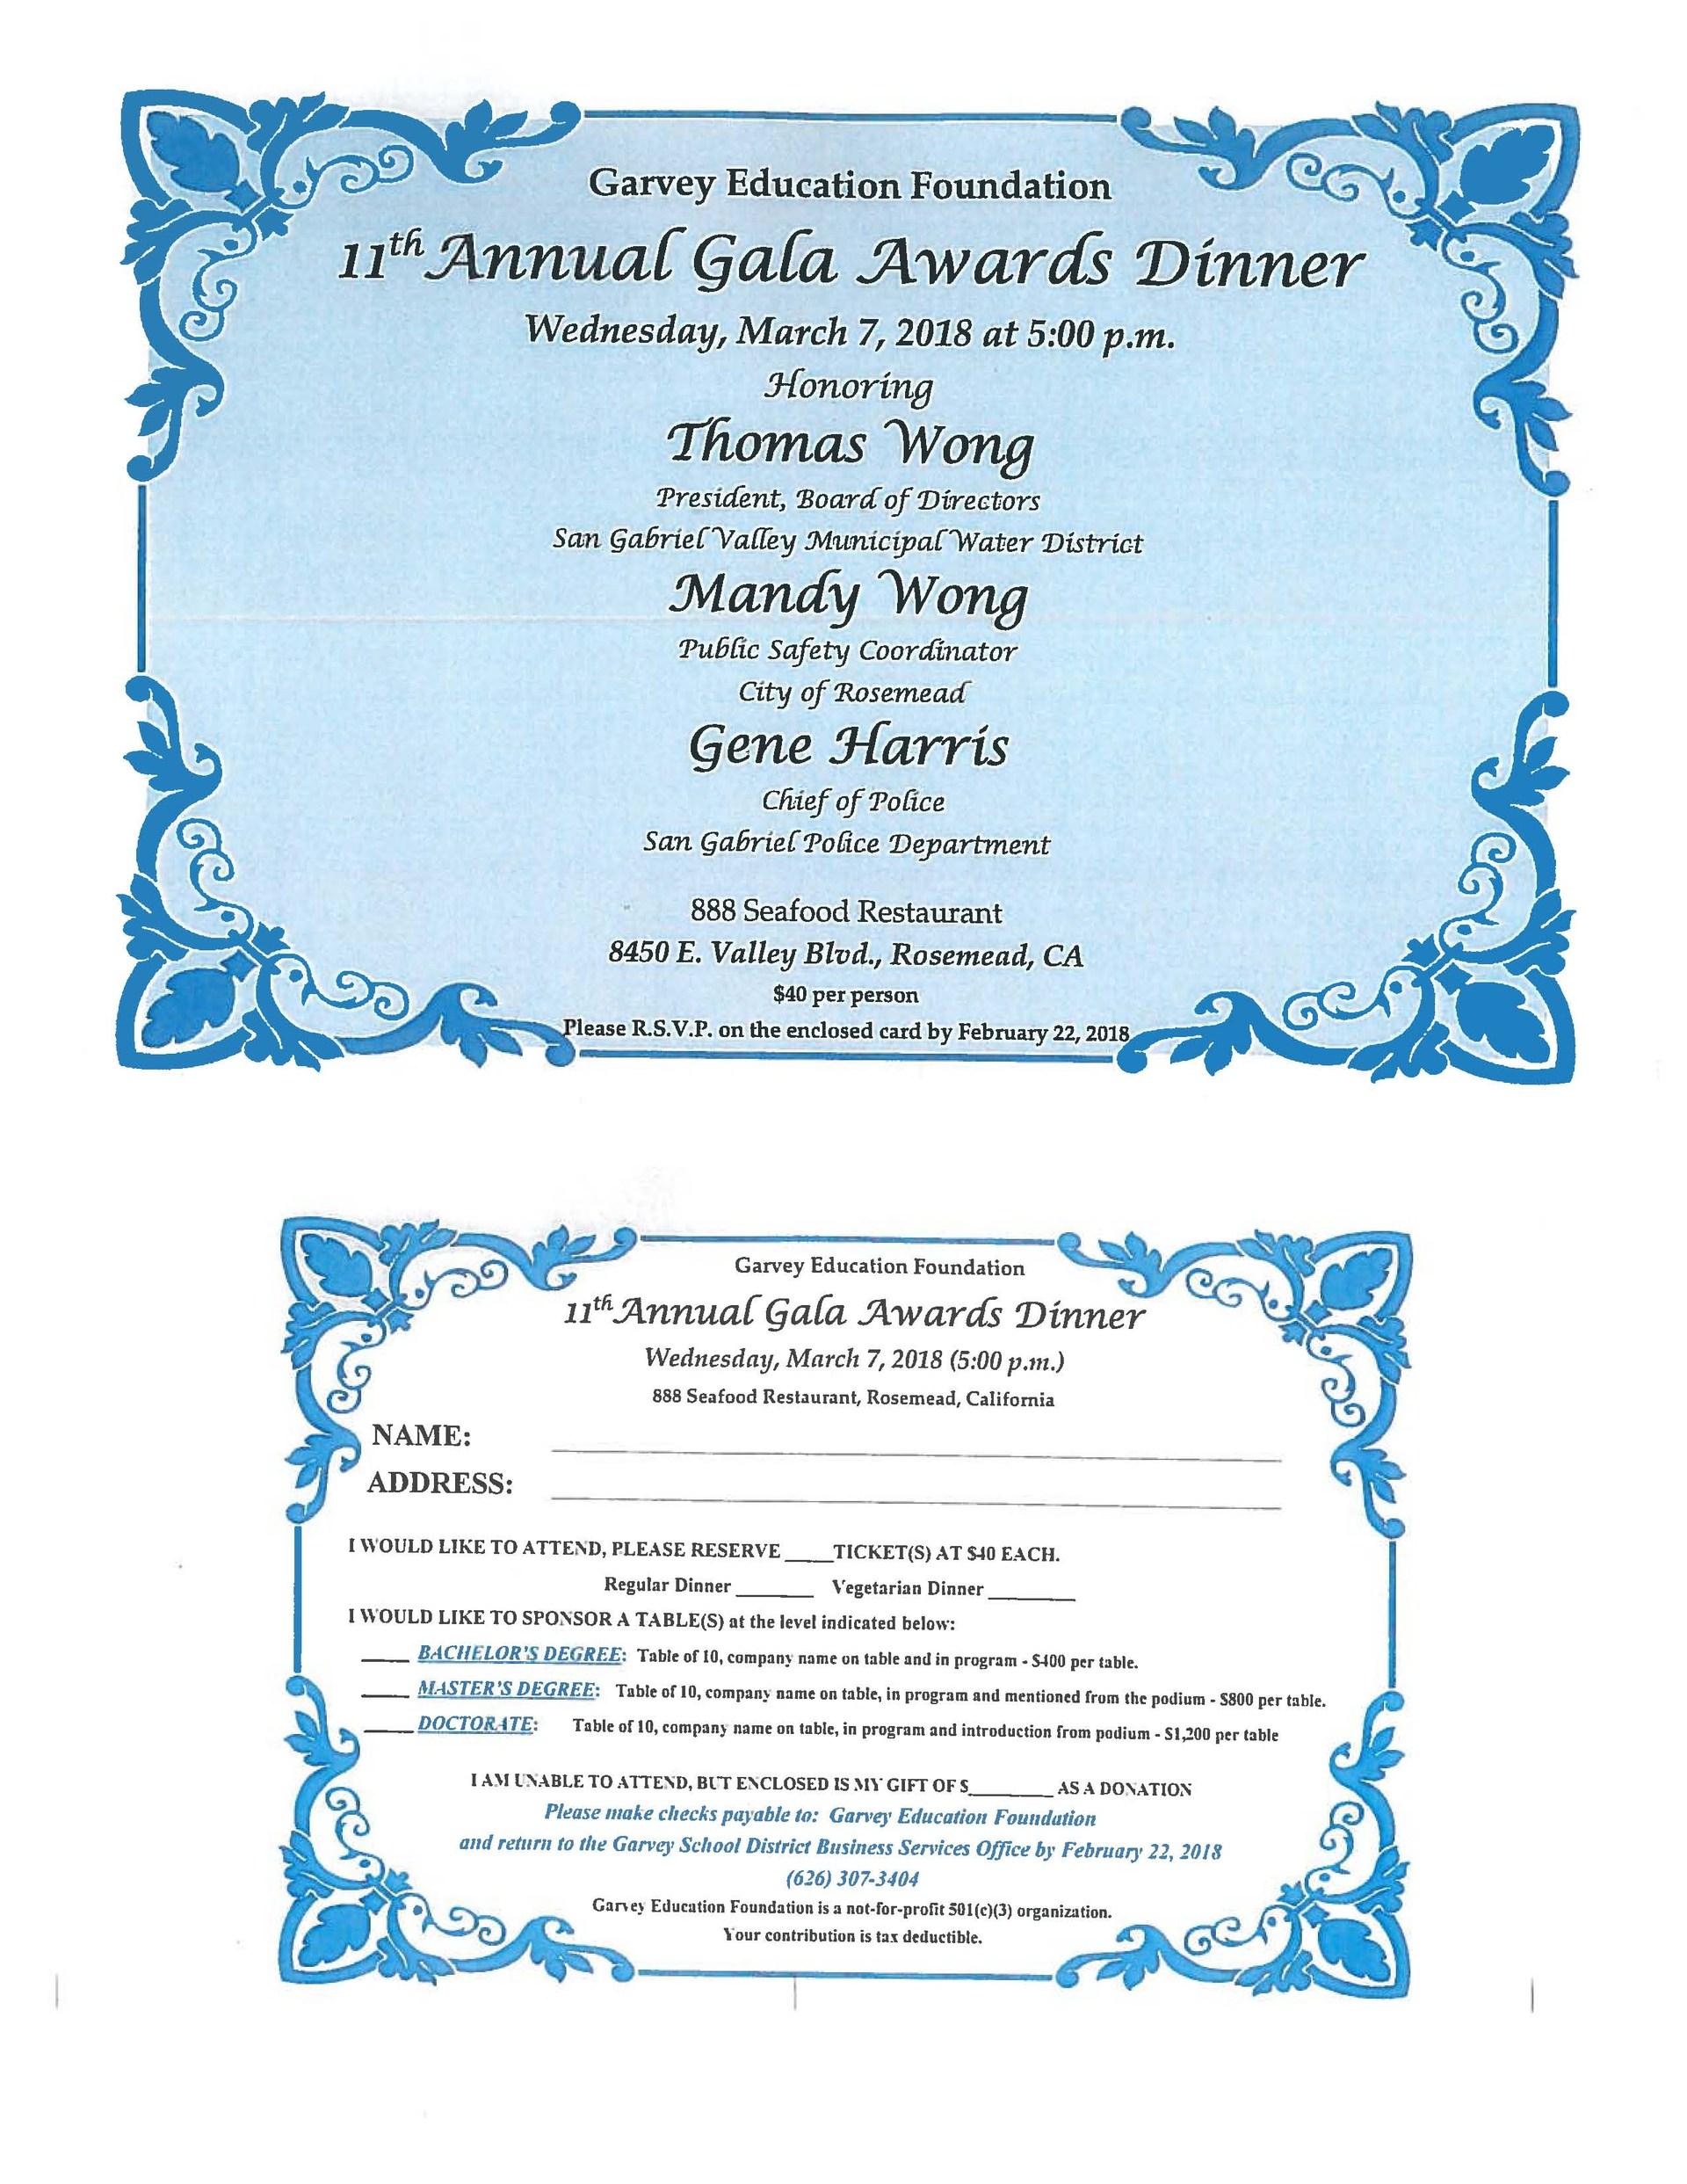 GEF Dinner Foundation